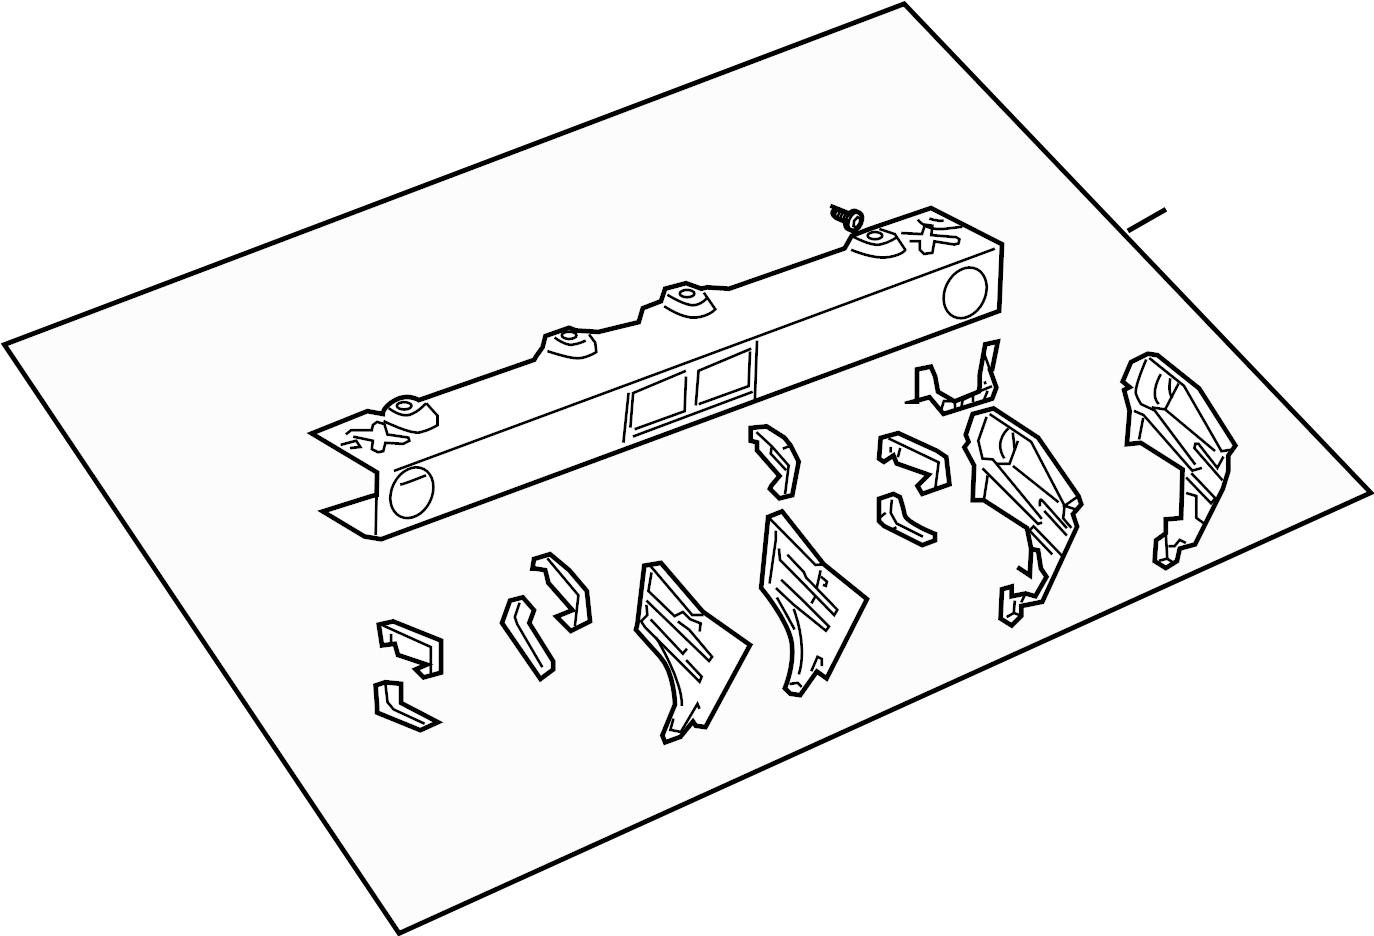 2005 pontiac montana sv6 parts diagrams  pontiac  auto